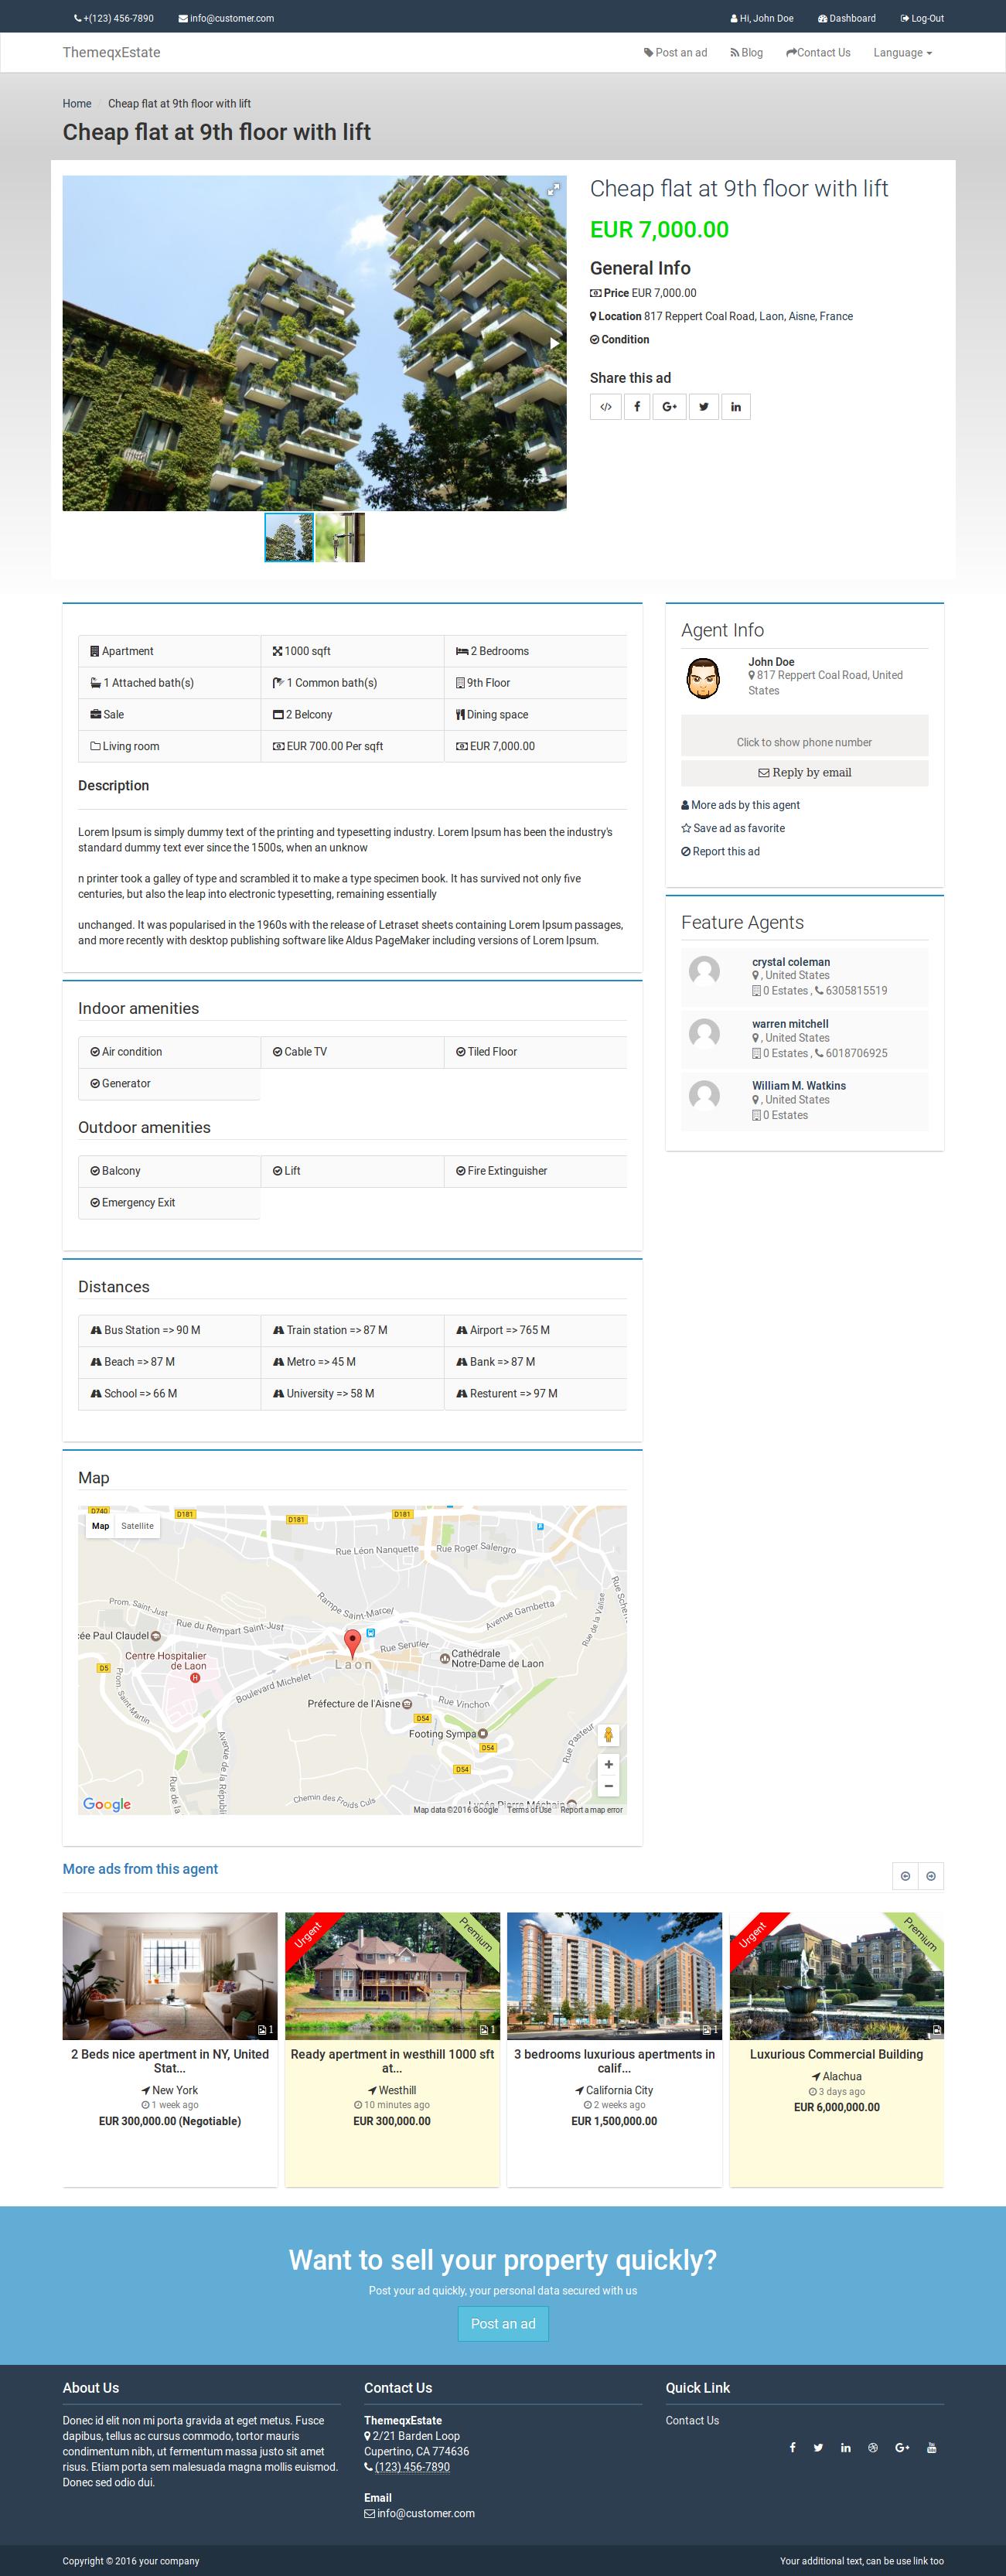 themeqxestate laravel real estate property listing portal by themeqx